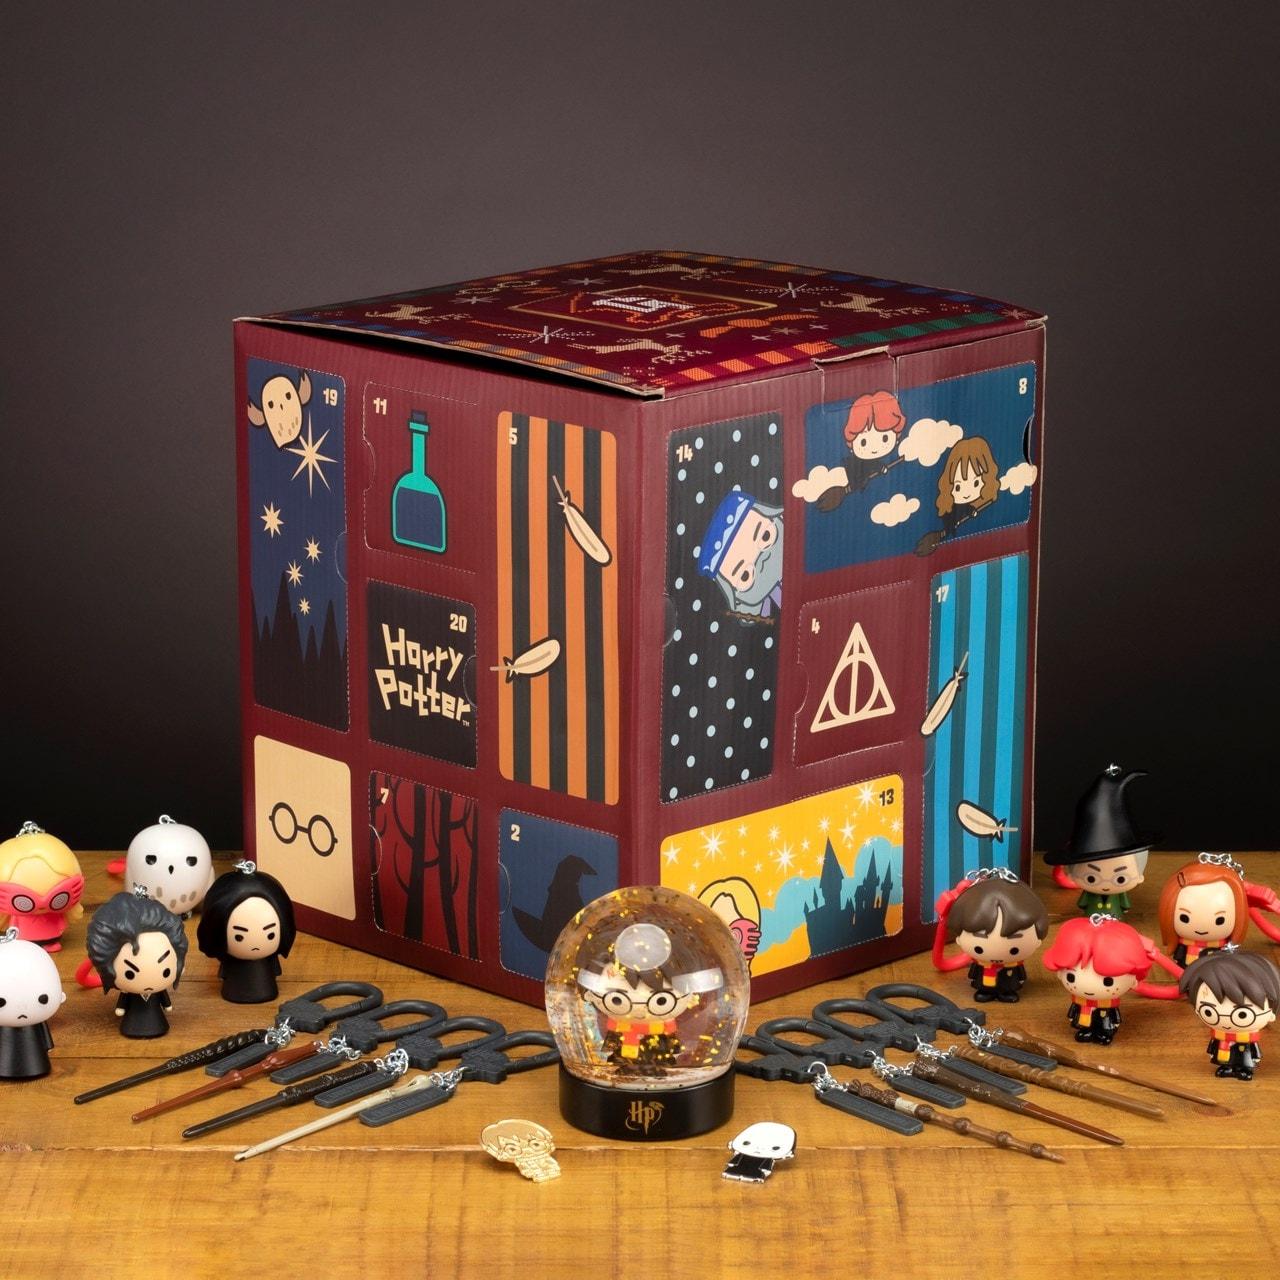 Harry Potter Advent Calendar Cube - 1